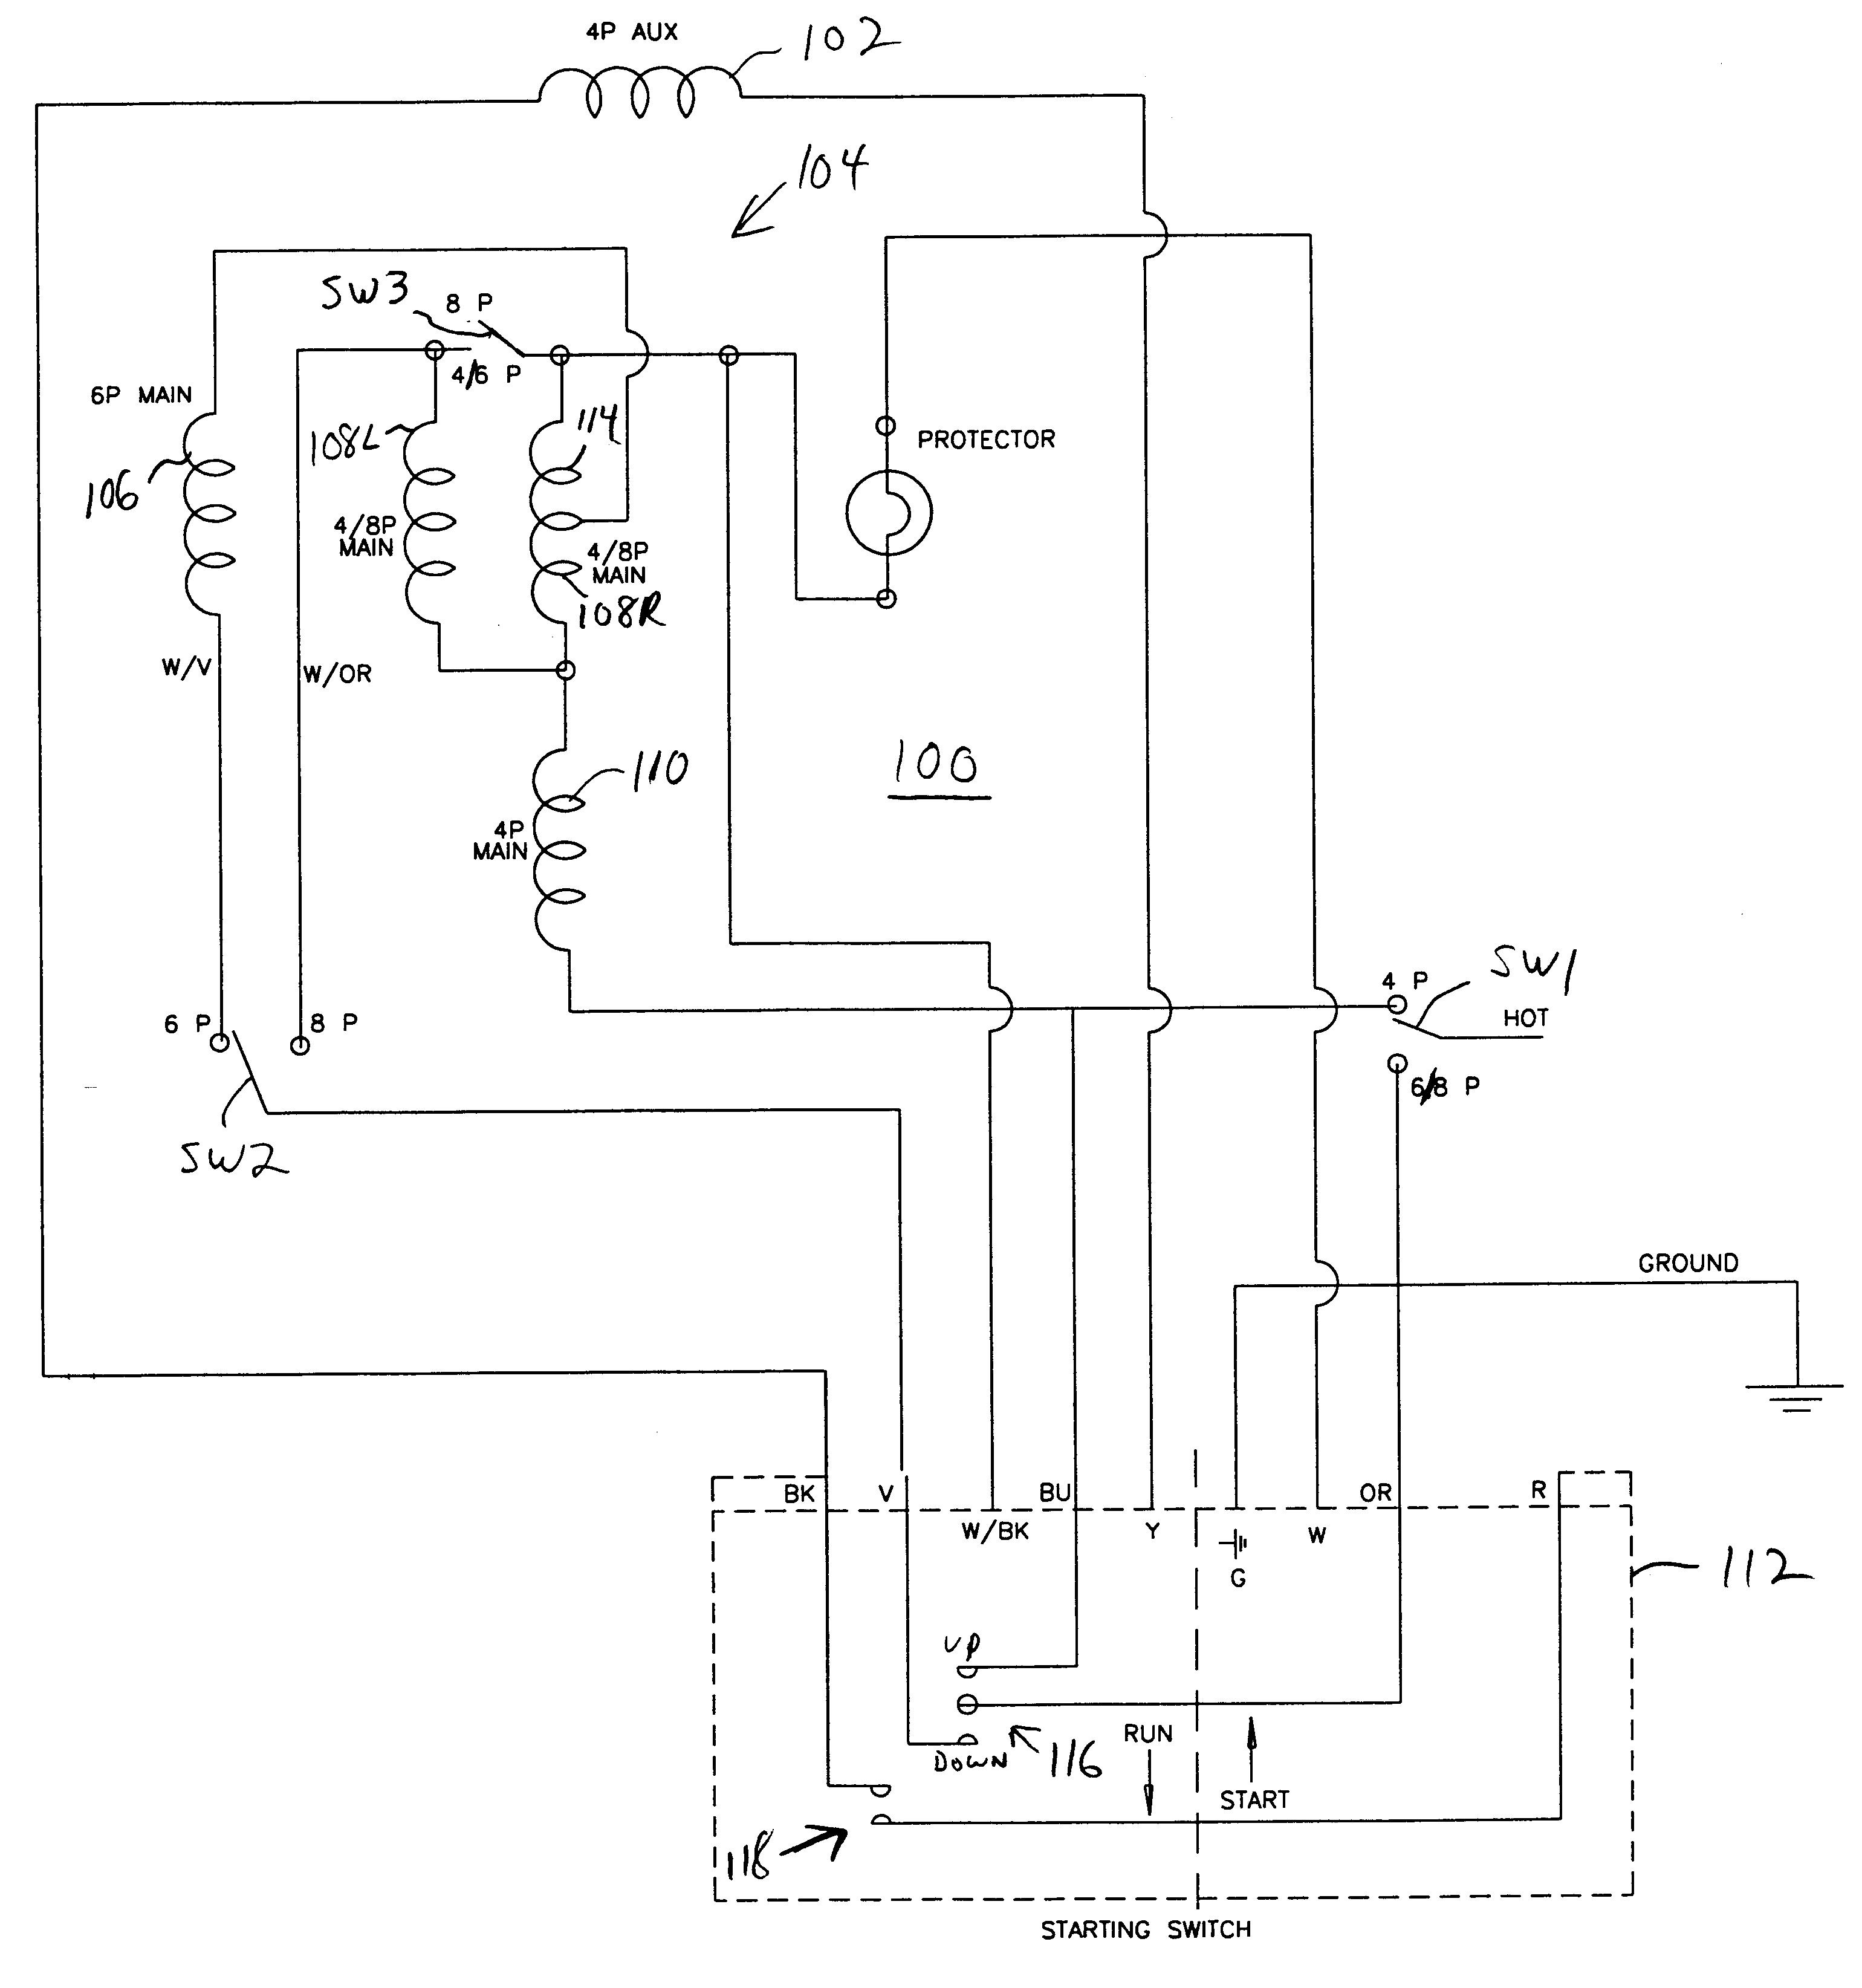 Diagram Wiring Diagram Ao Smith Motor Full Version Hd Quality Smith Motor Blogxgoo Mefpie Fr